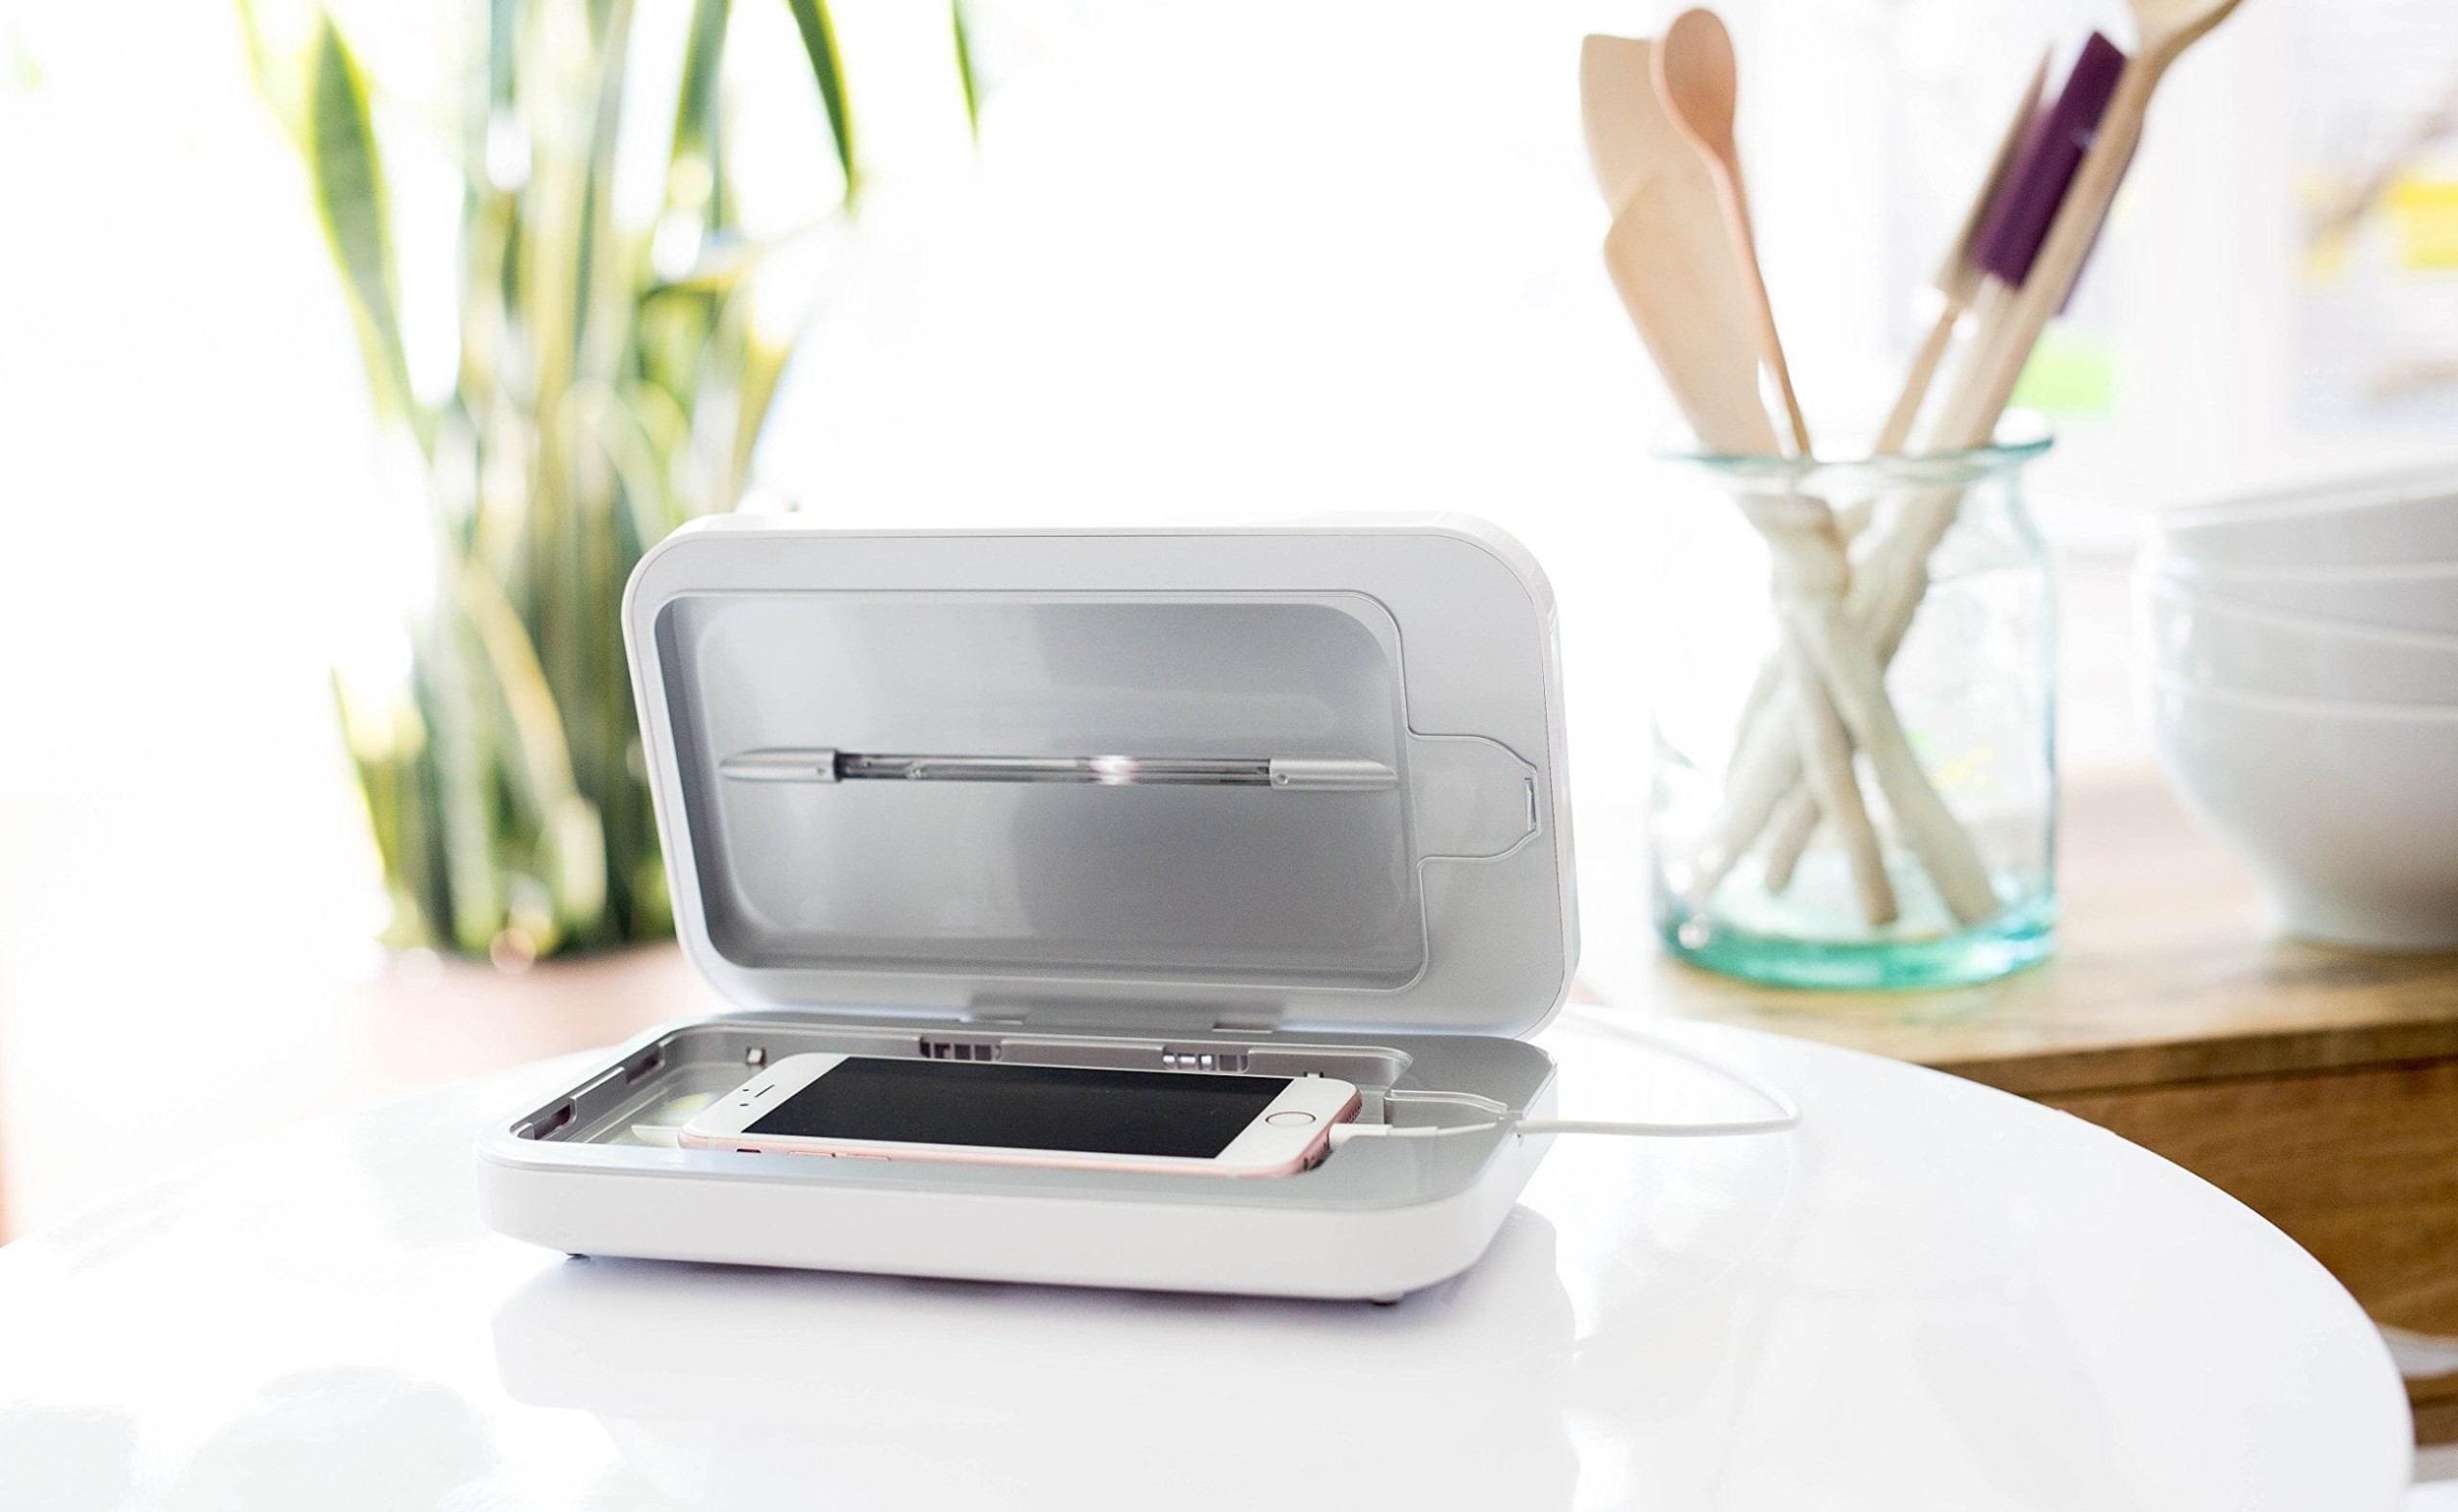 PhoneSoap 3 UV Phone Sanitizer